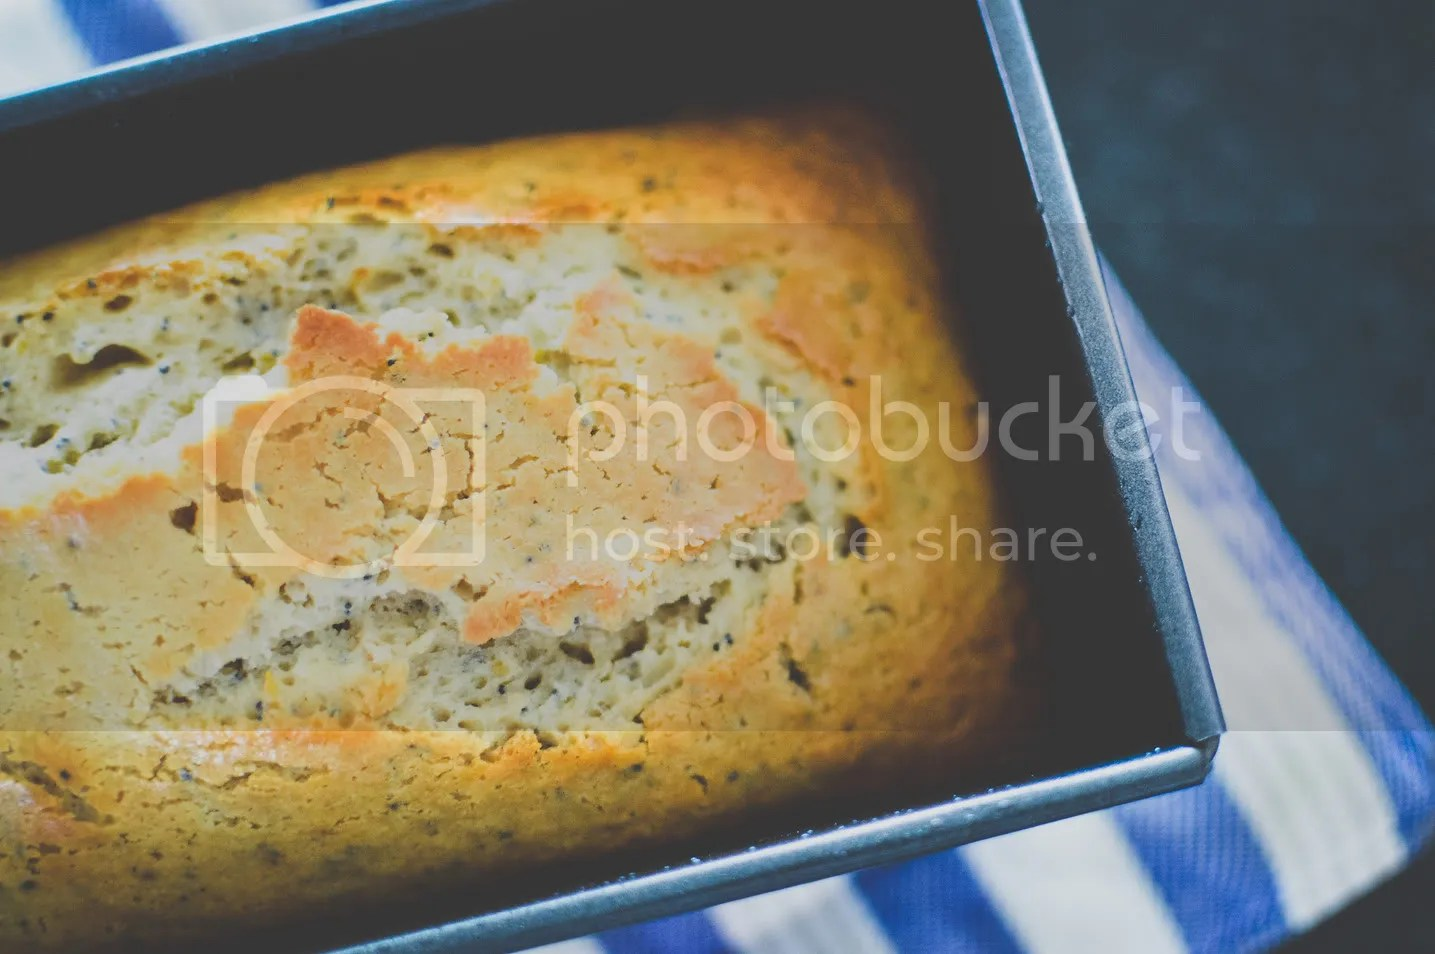 Spiced Orange and Poppy Seed Cake